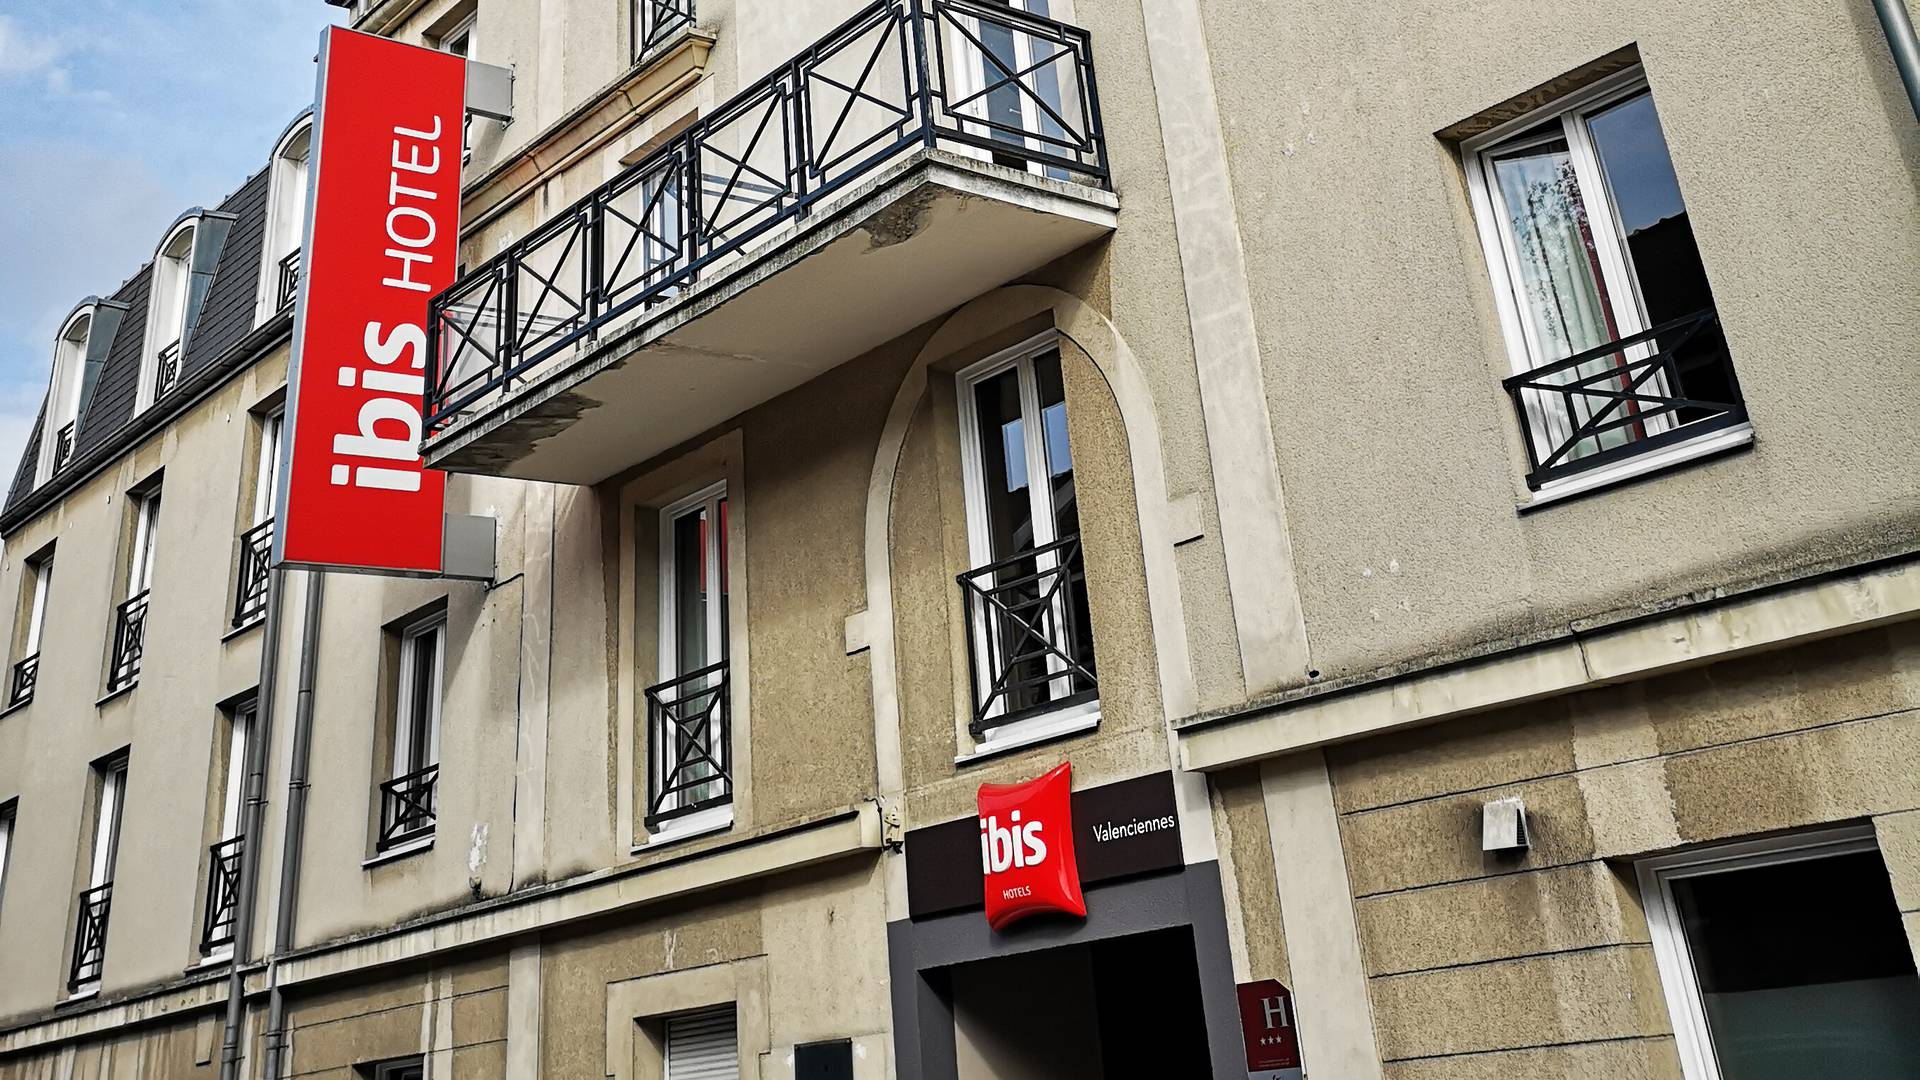 Valenciennes hôtel Ibis